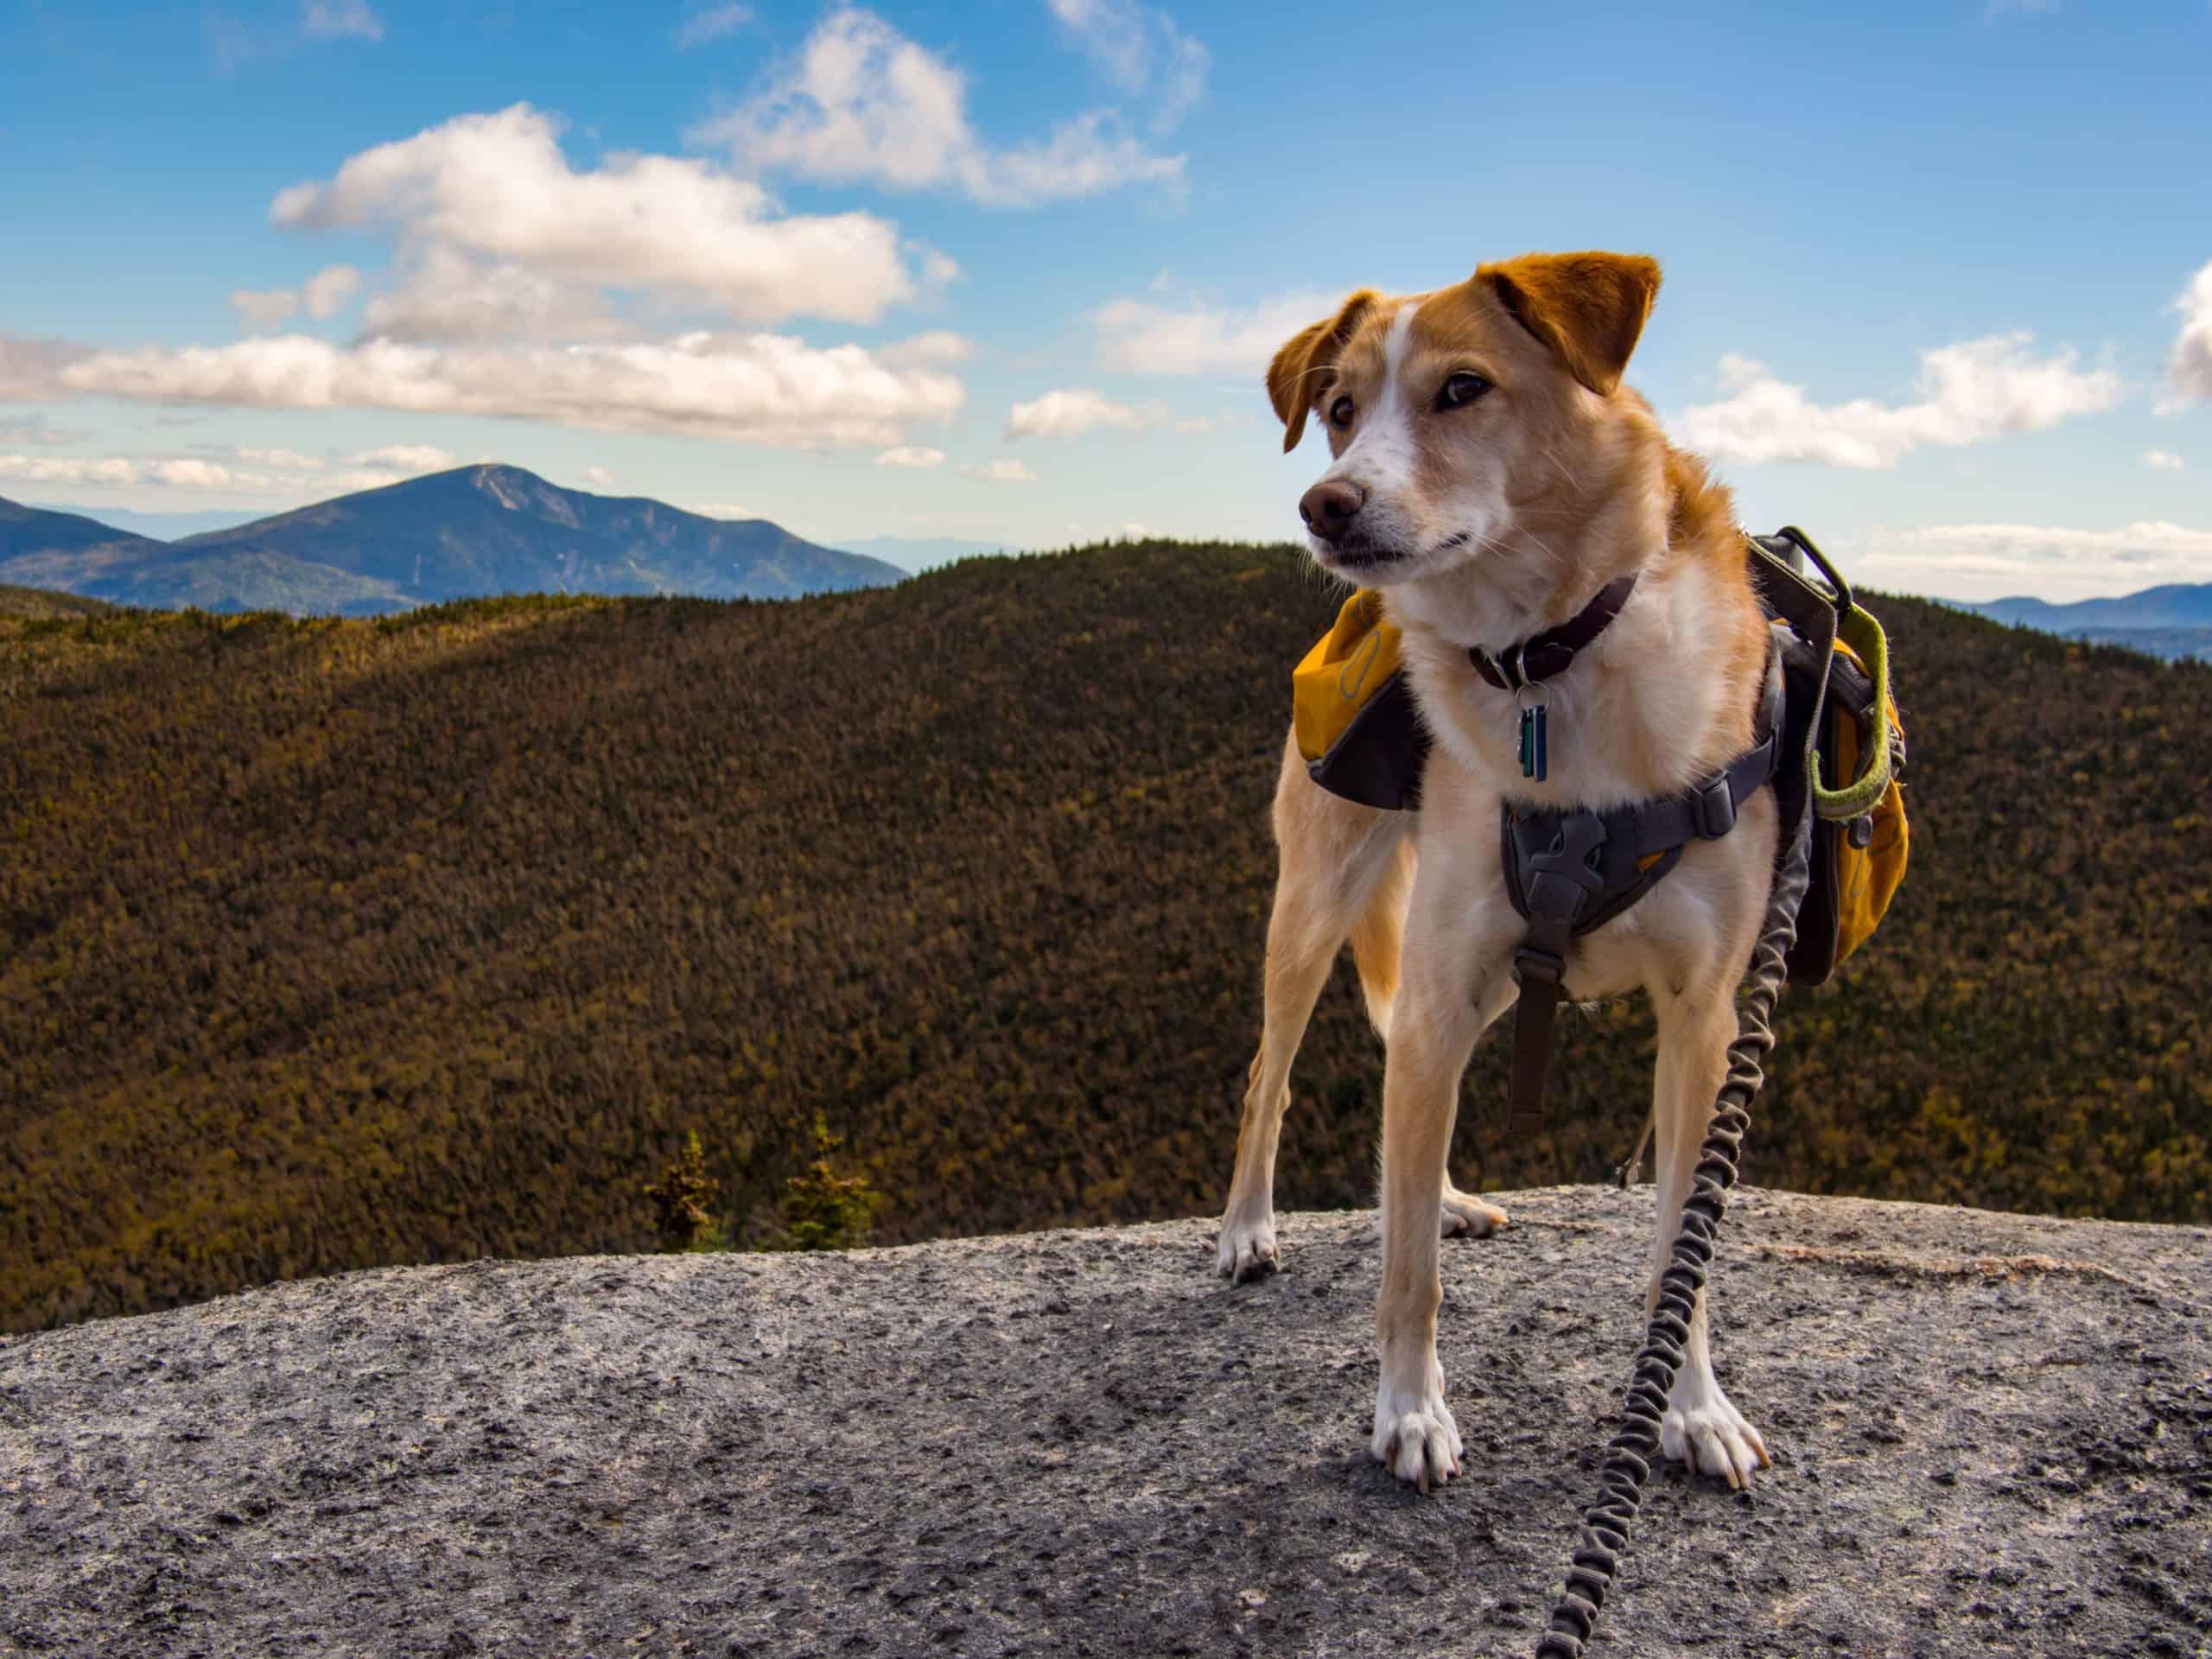 Dog on a trekking adventure wears a backpack.